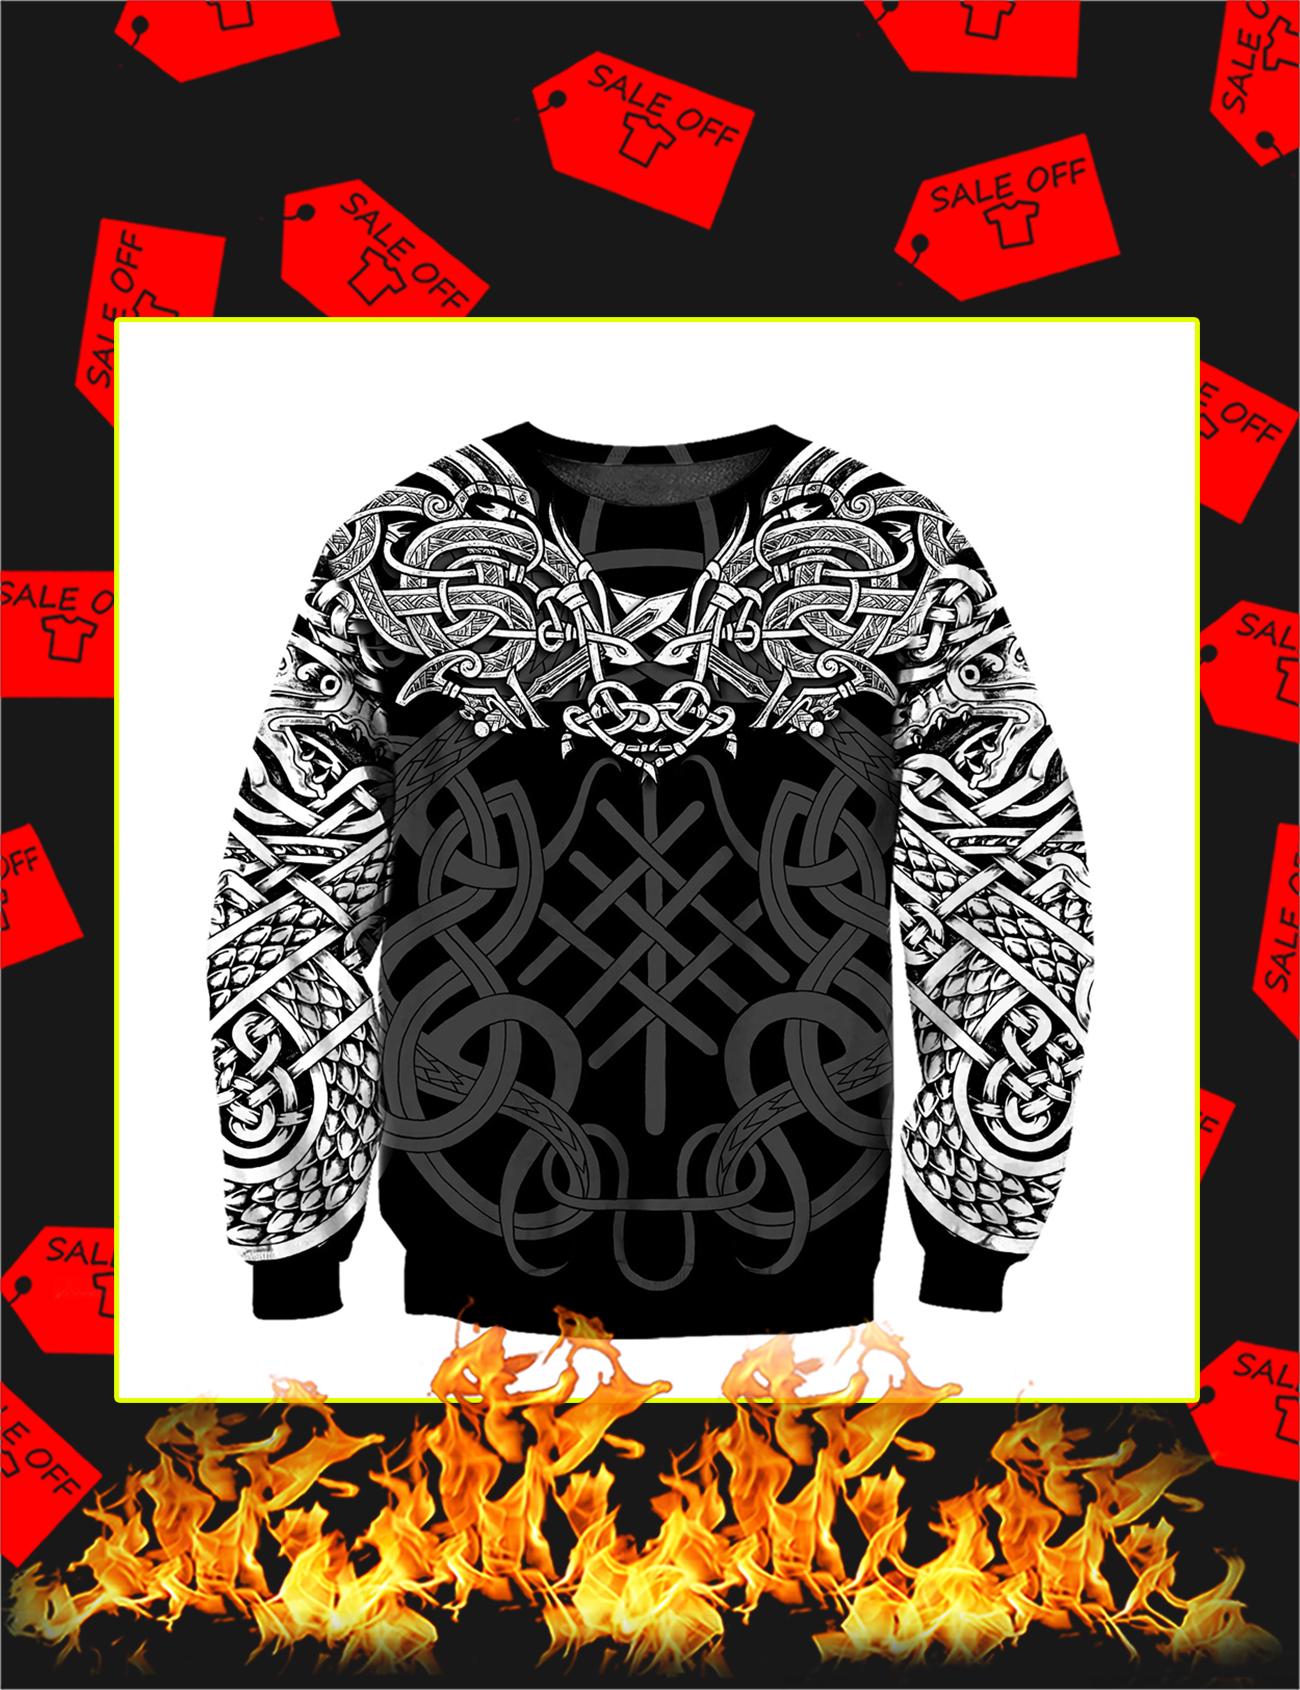 Celtic Dragon Tattoo Art 3D All Over Printed Sweatshirt